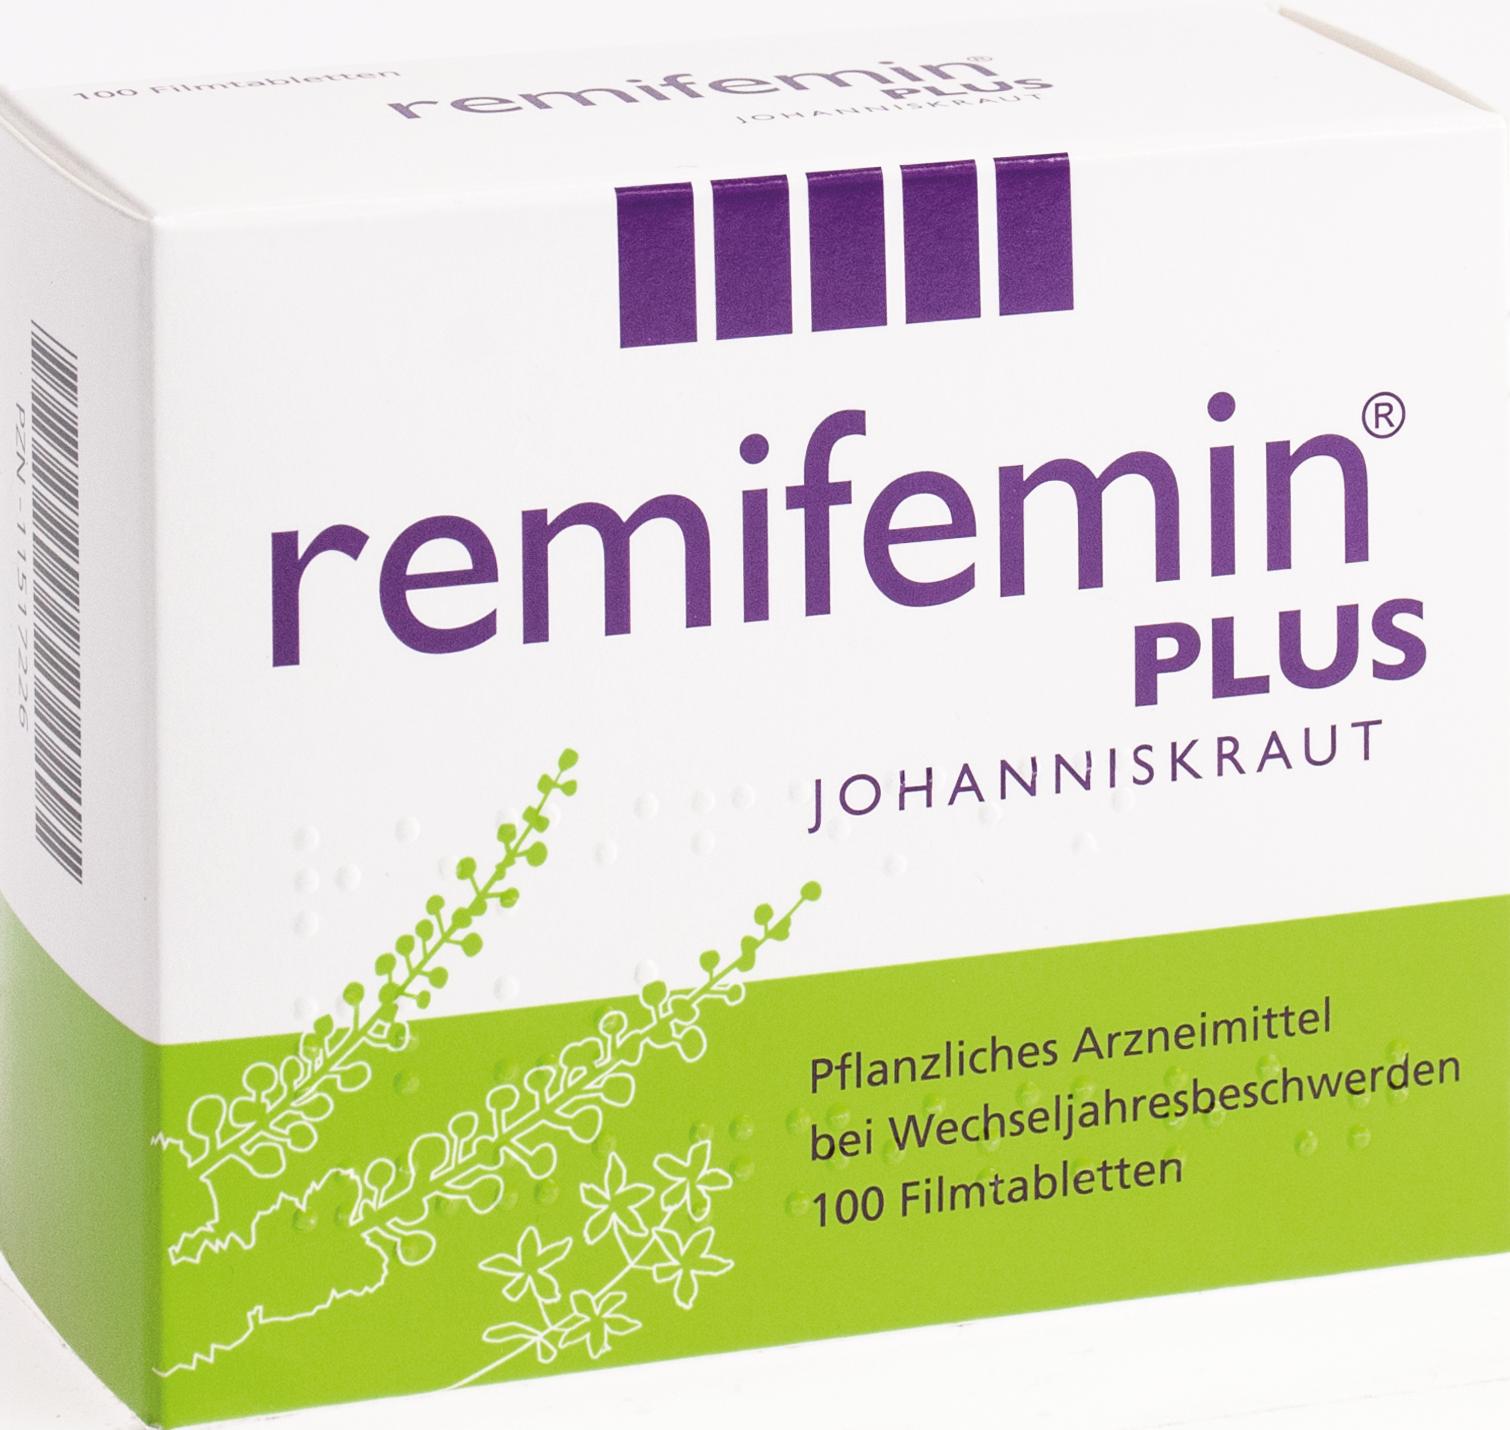 Remifemin plus Johanniskraut